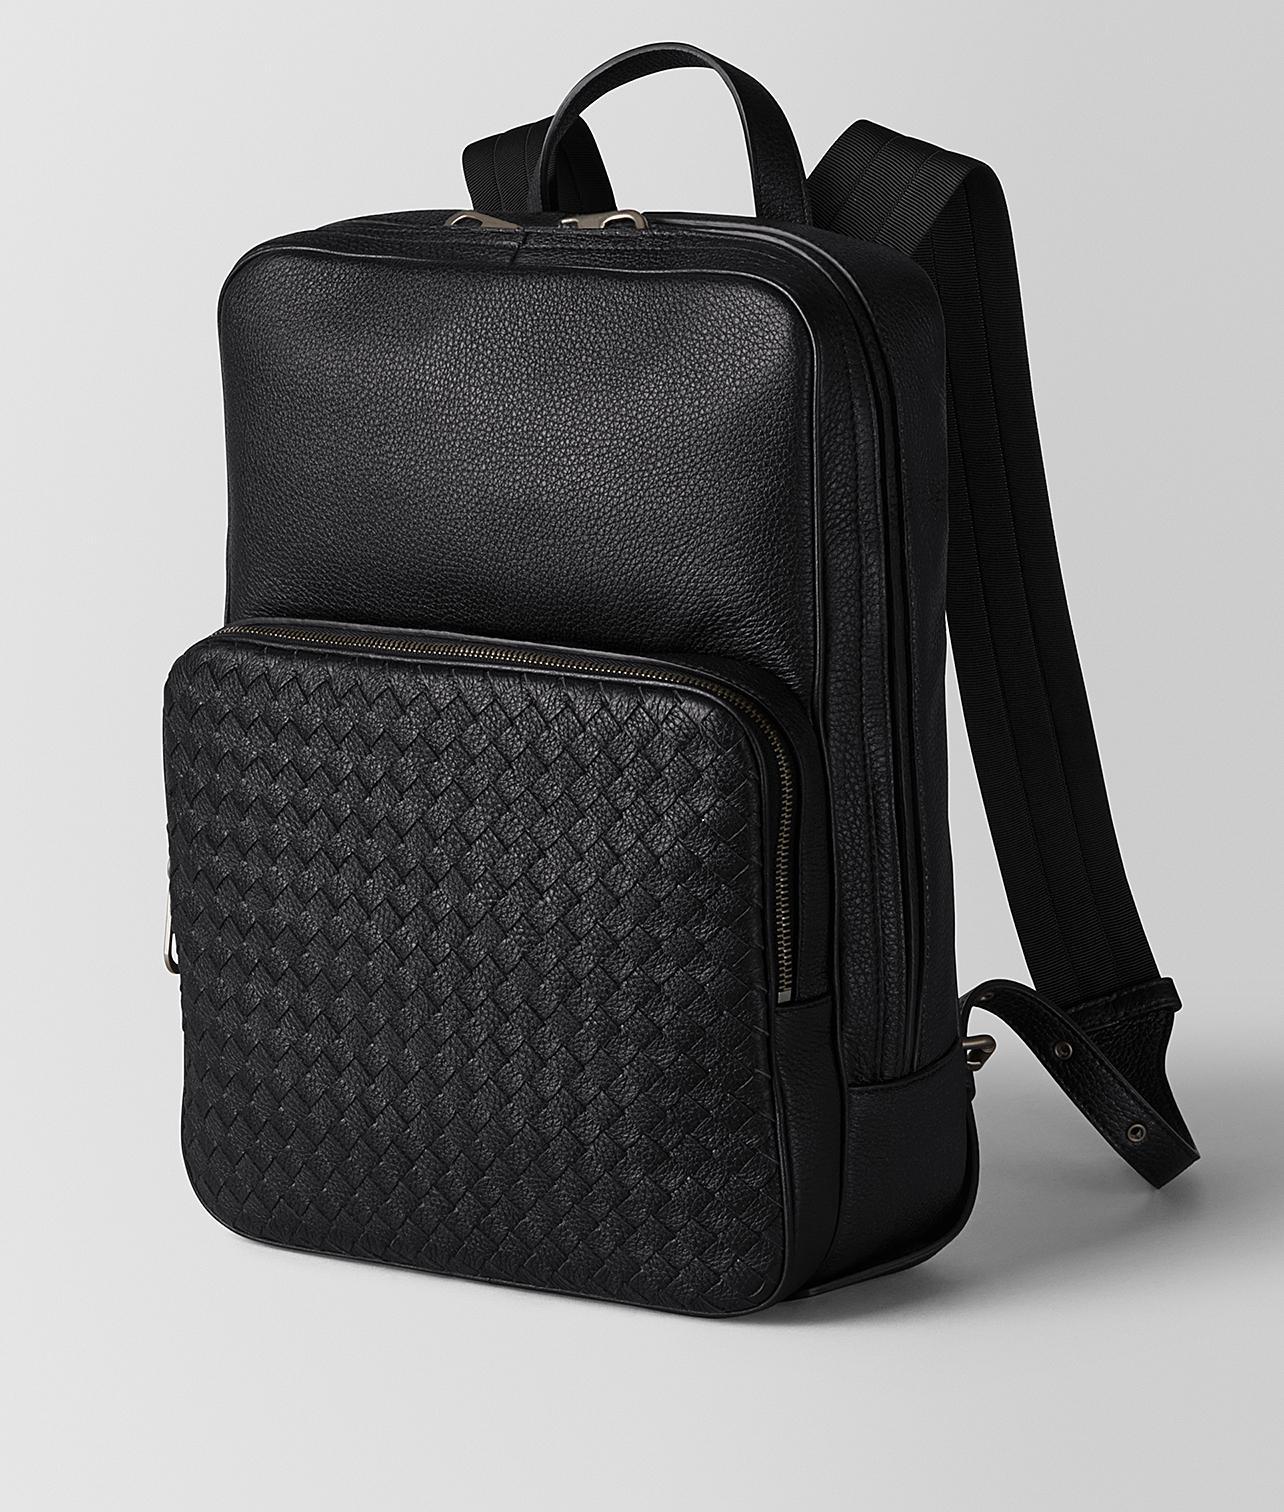 Bottega Veneta Nero Cervo Medium Double Brick in Black for Men - Lyst b35a1b12de273